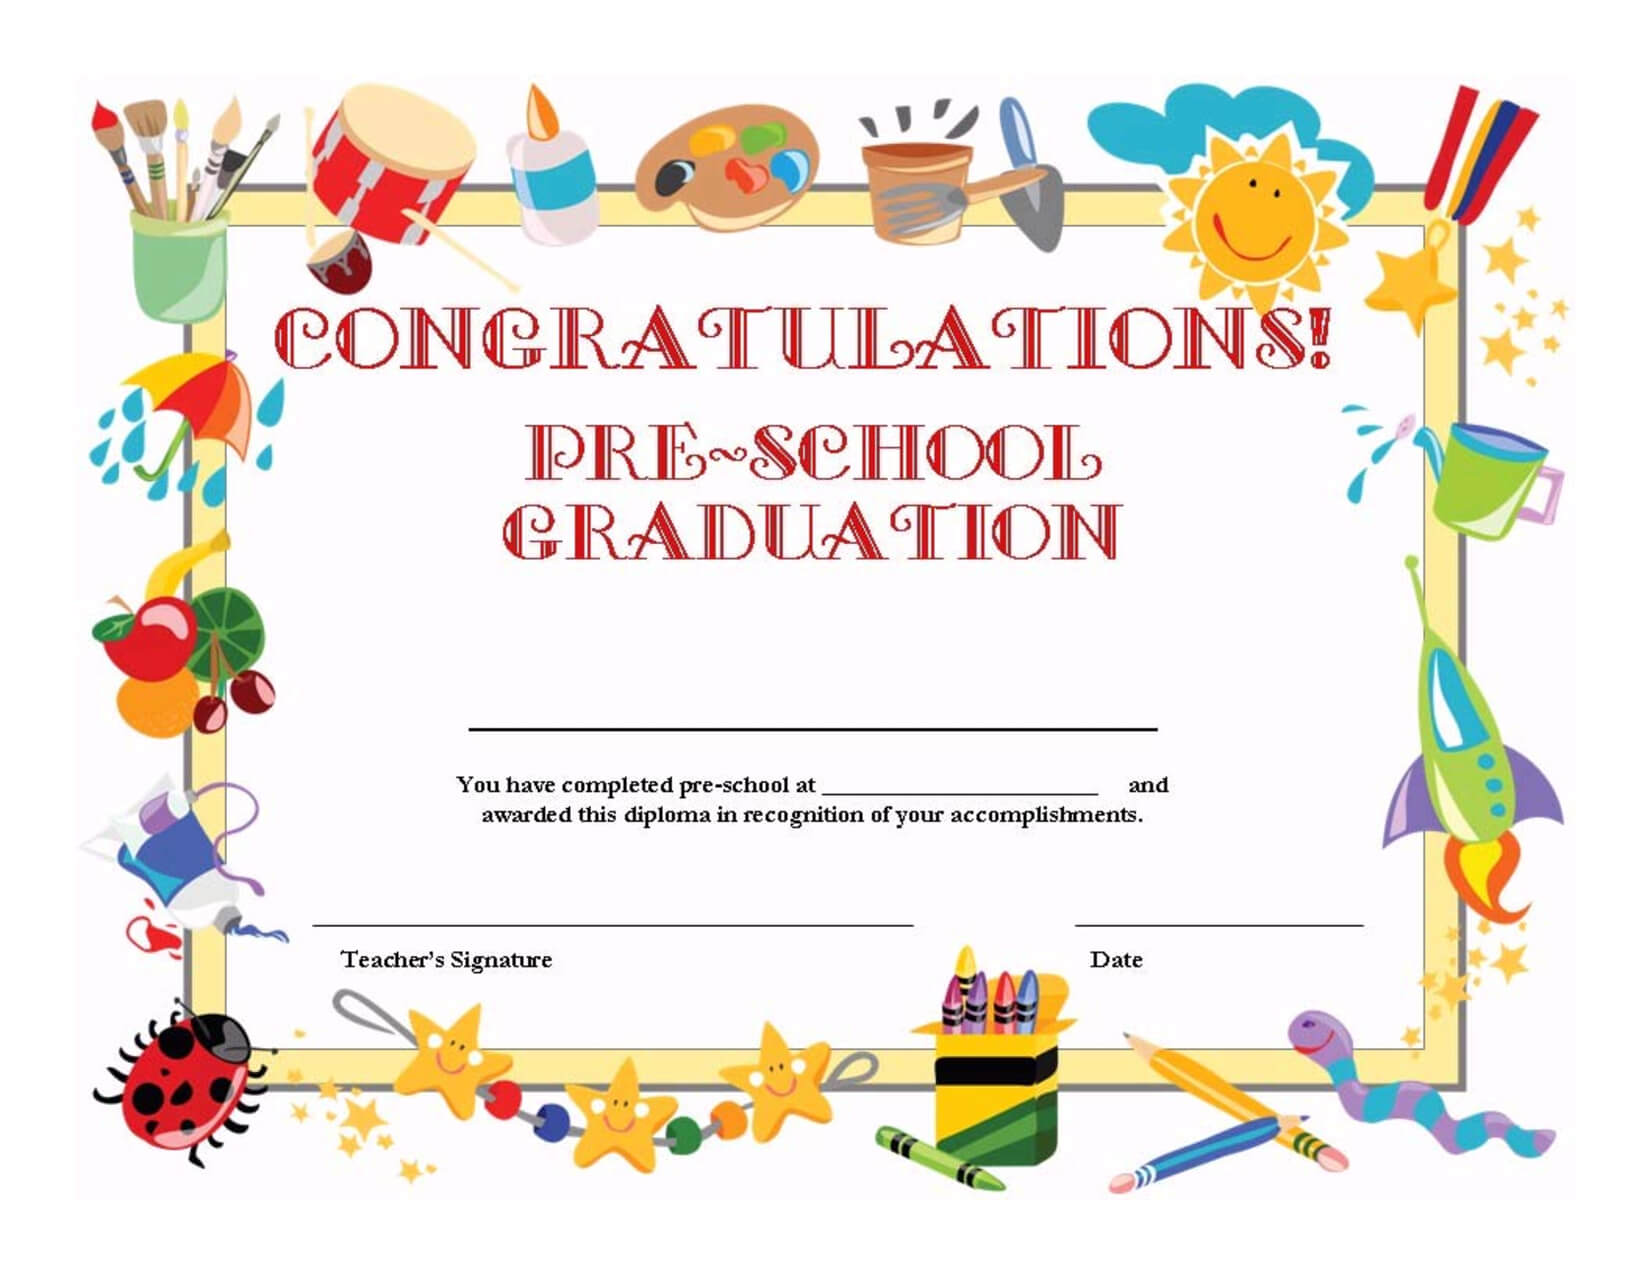 Preschool Graduation Certificate Template Free inside Free School Certificate Templates